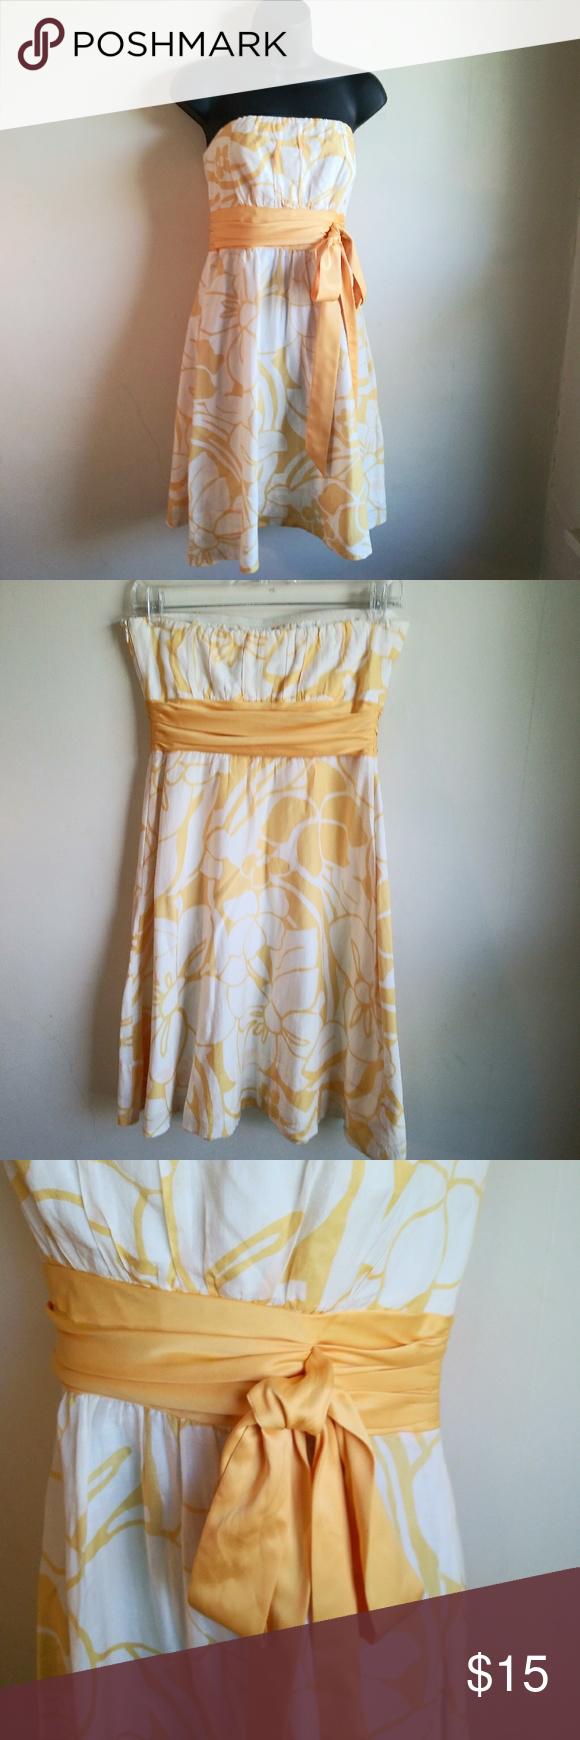 The Limited Strapless Yellow White Dress Sz 4 Yellow And White Dress The Limited Dresses White Dress [ 1740 x 580 Pixel ]